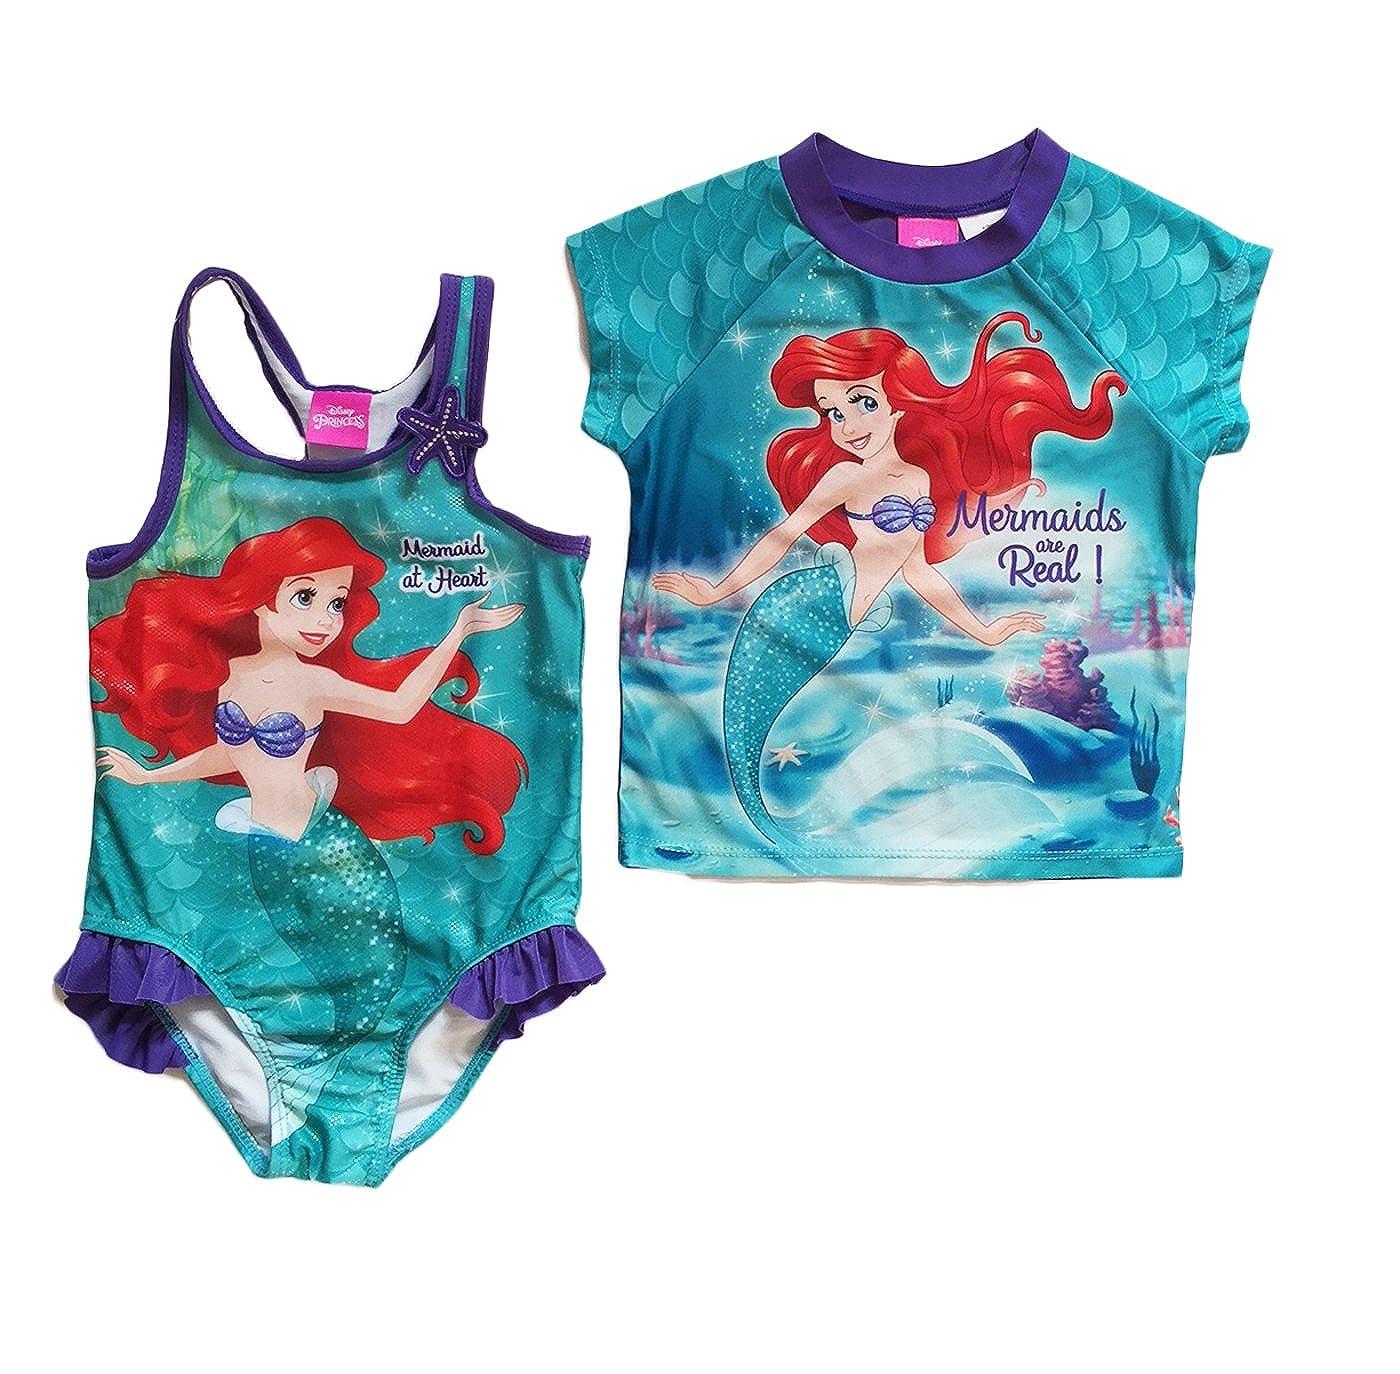 Disney Little Mermaid Ariel Little Girls Swimsuit and Rash Guard Set